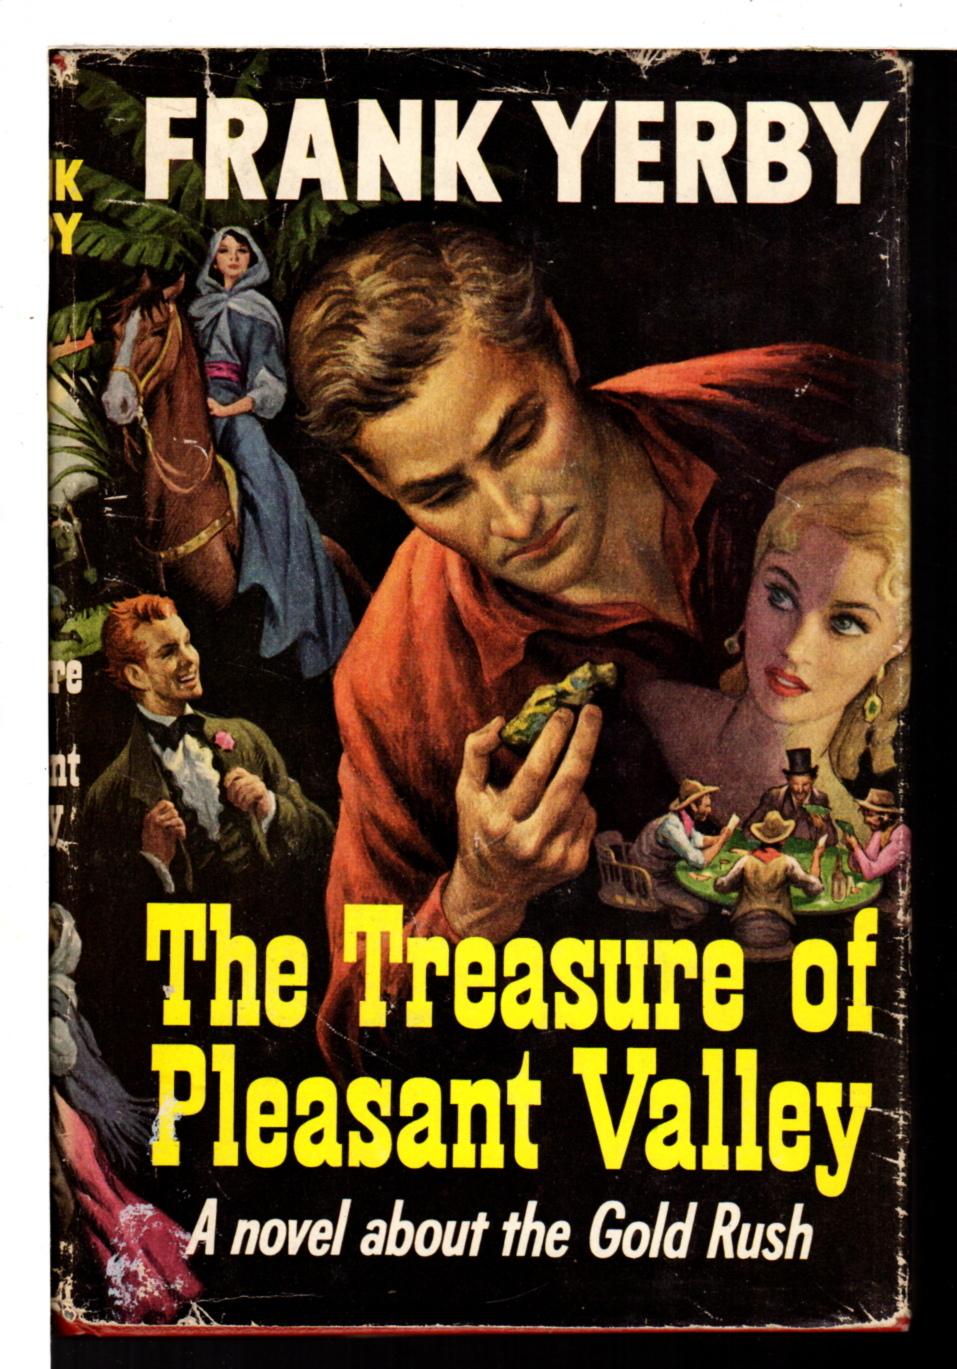 YERBY, FRANK. - TREASURE OF PLEASANT VALLEY.